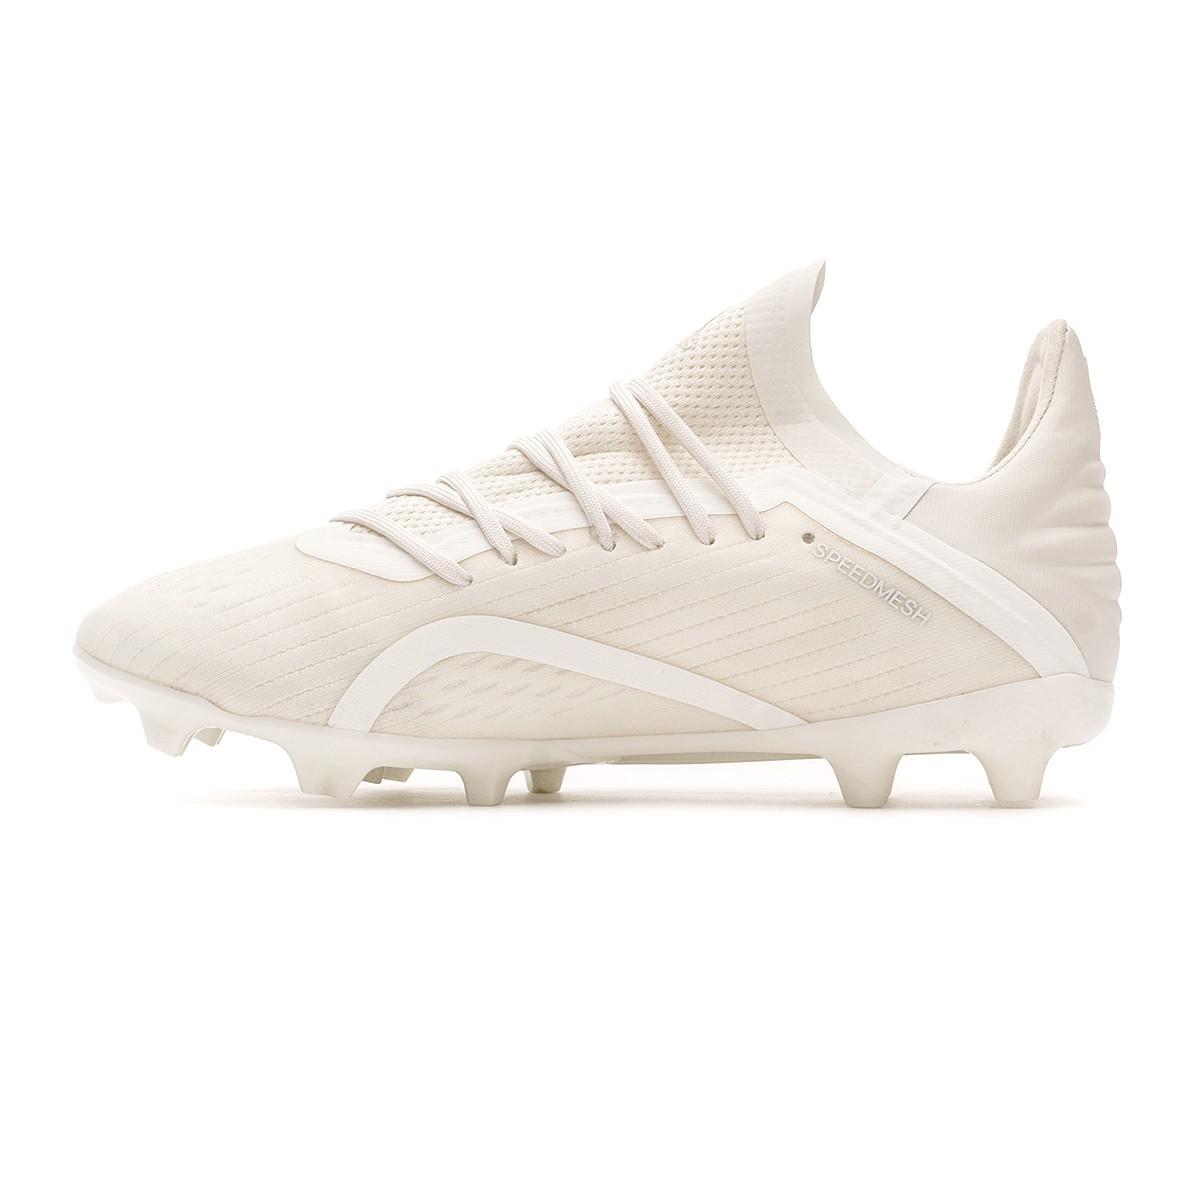 21a066505 Football Boots adidas Kids X 18.1 FG Off white-White-Core black - Football  store Fútbol Emotion